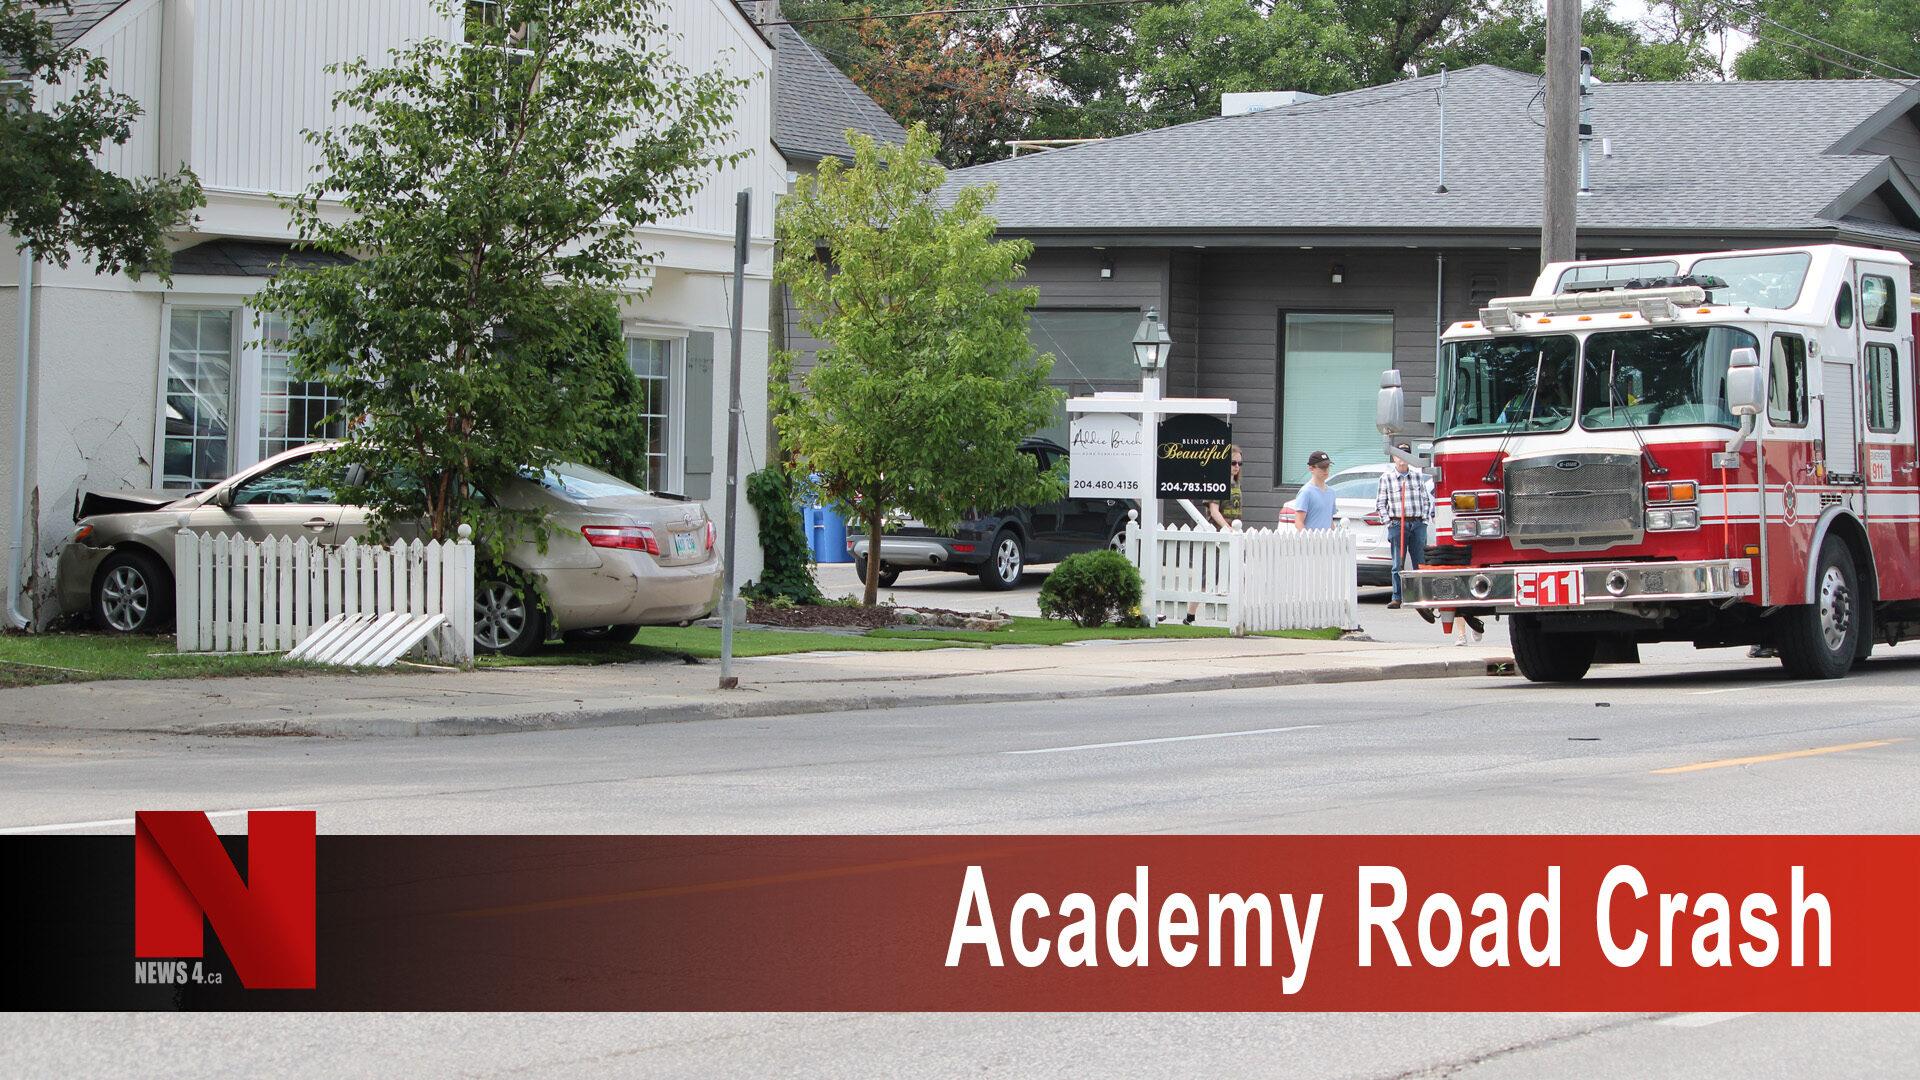 Academy Road Crash